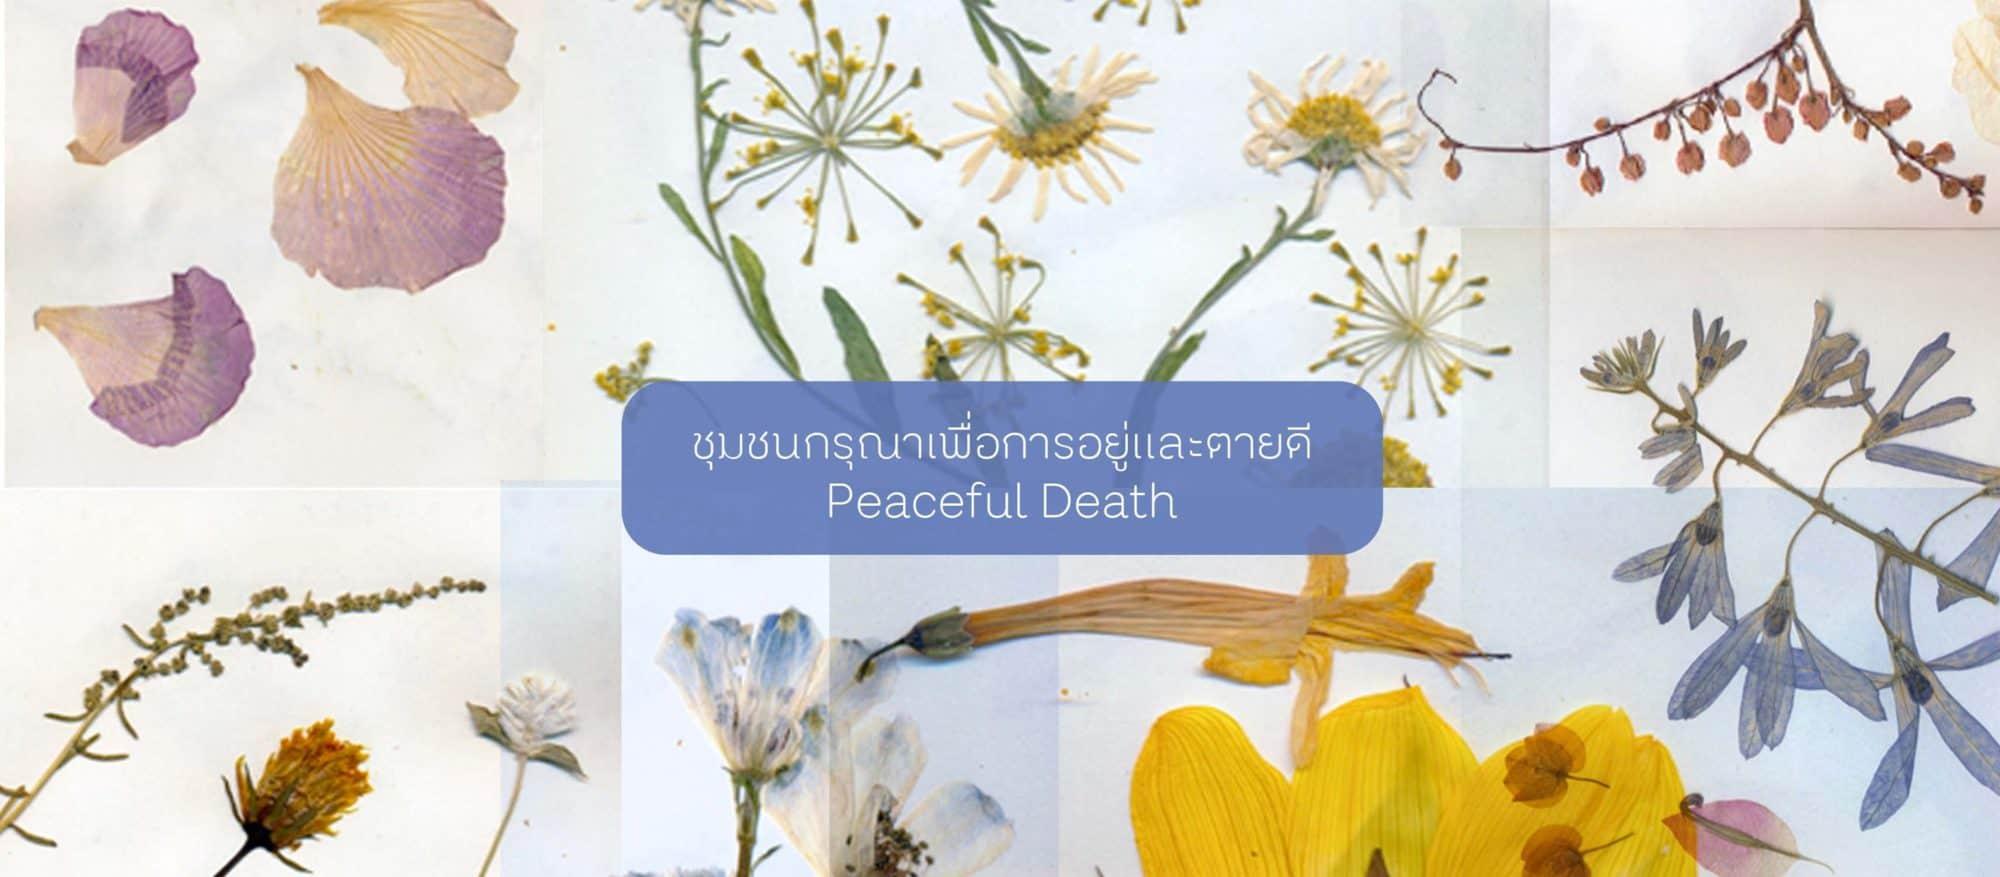 Peaceful Death ชุมชนกรุณาเพื่อการอยู่และตายดี